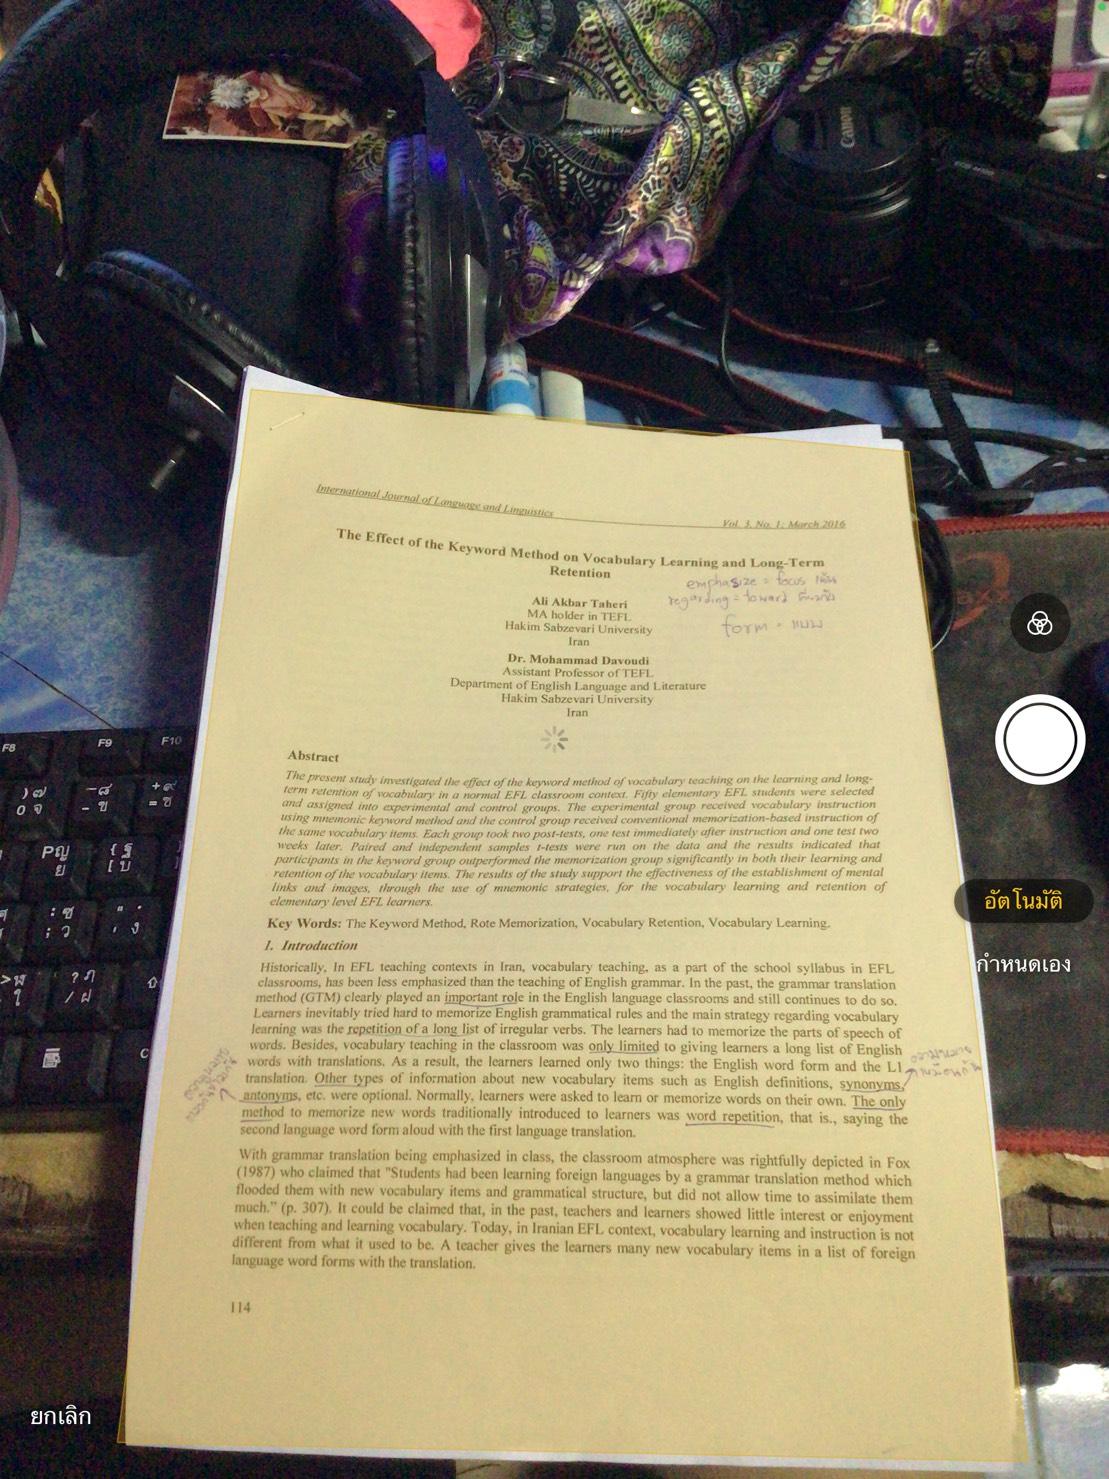 IPhone iPad  สุดยอด สแกนเอกสาร ได้ ไม่ต้องถ่ายรูปให้เสียเวลา